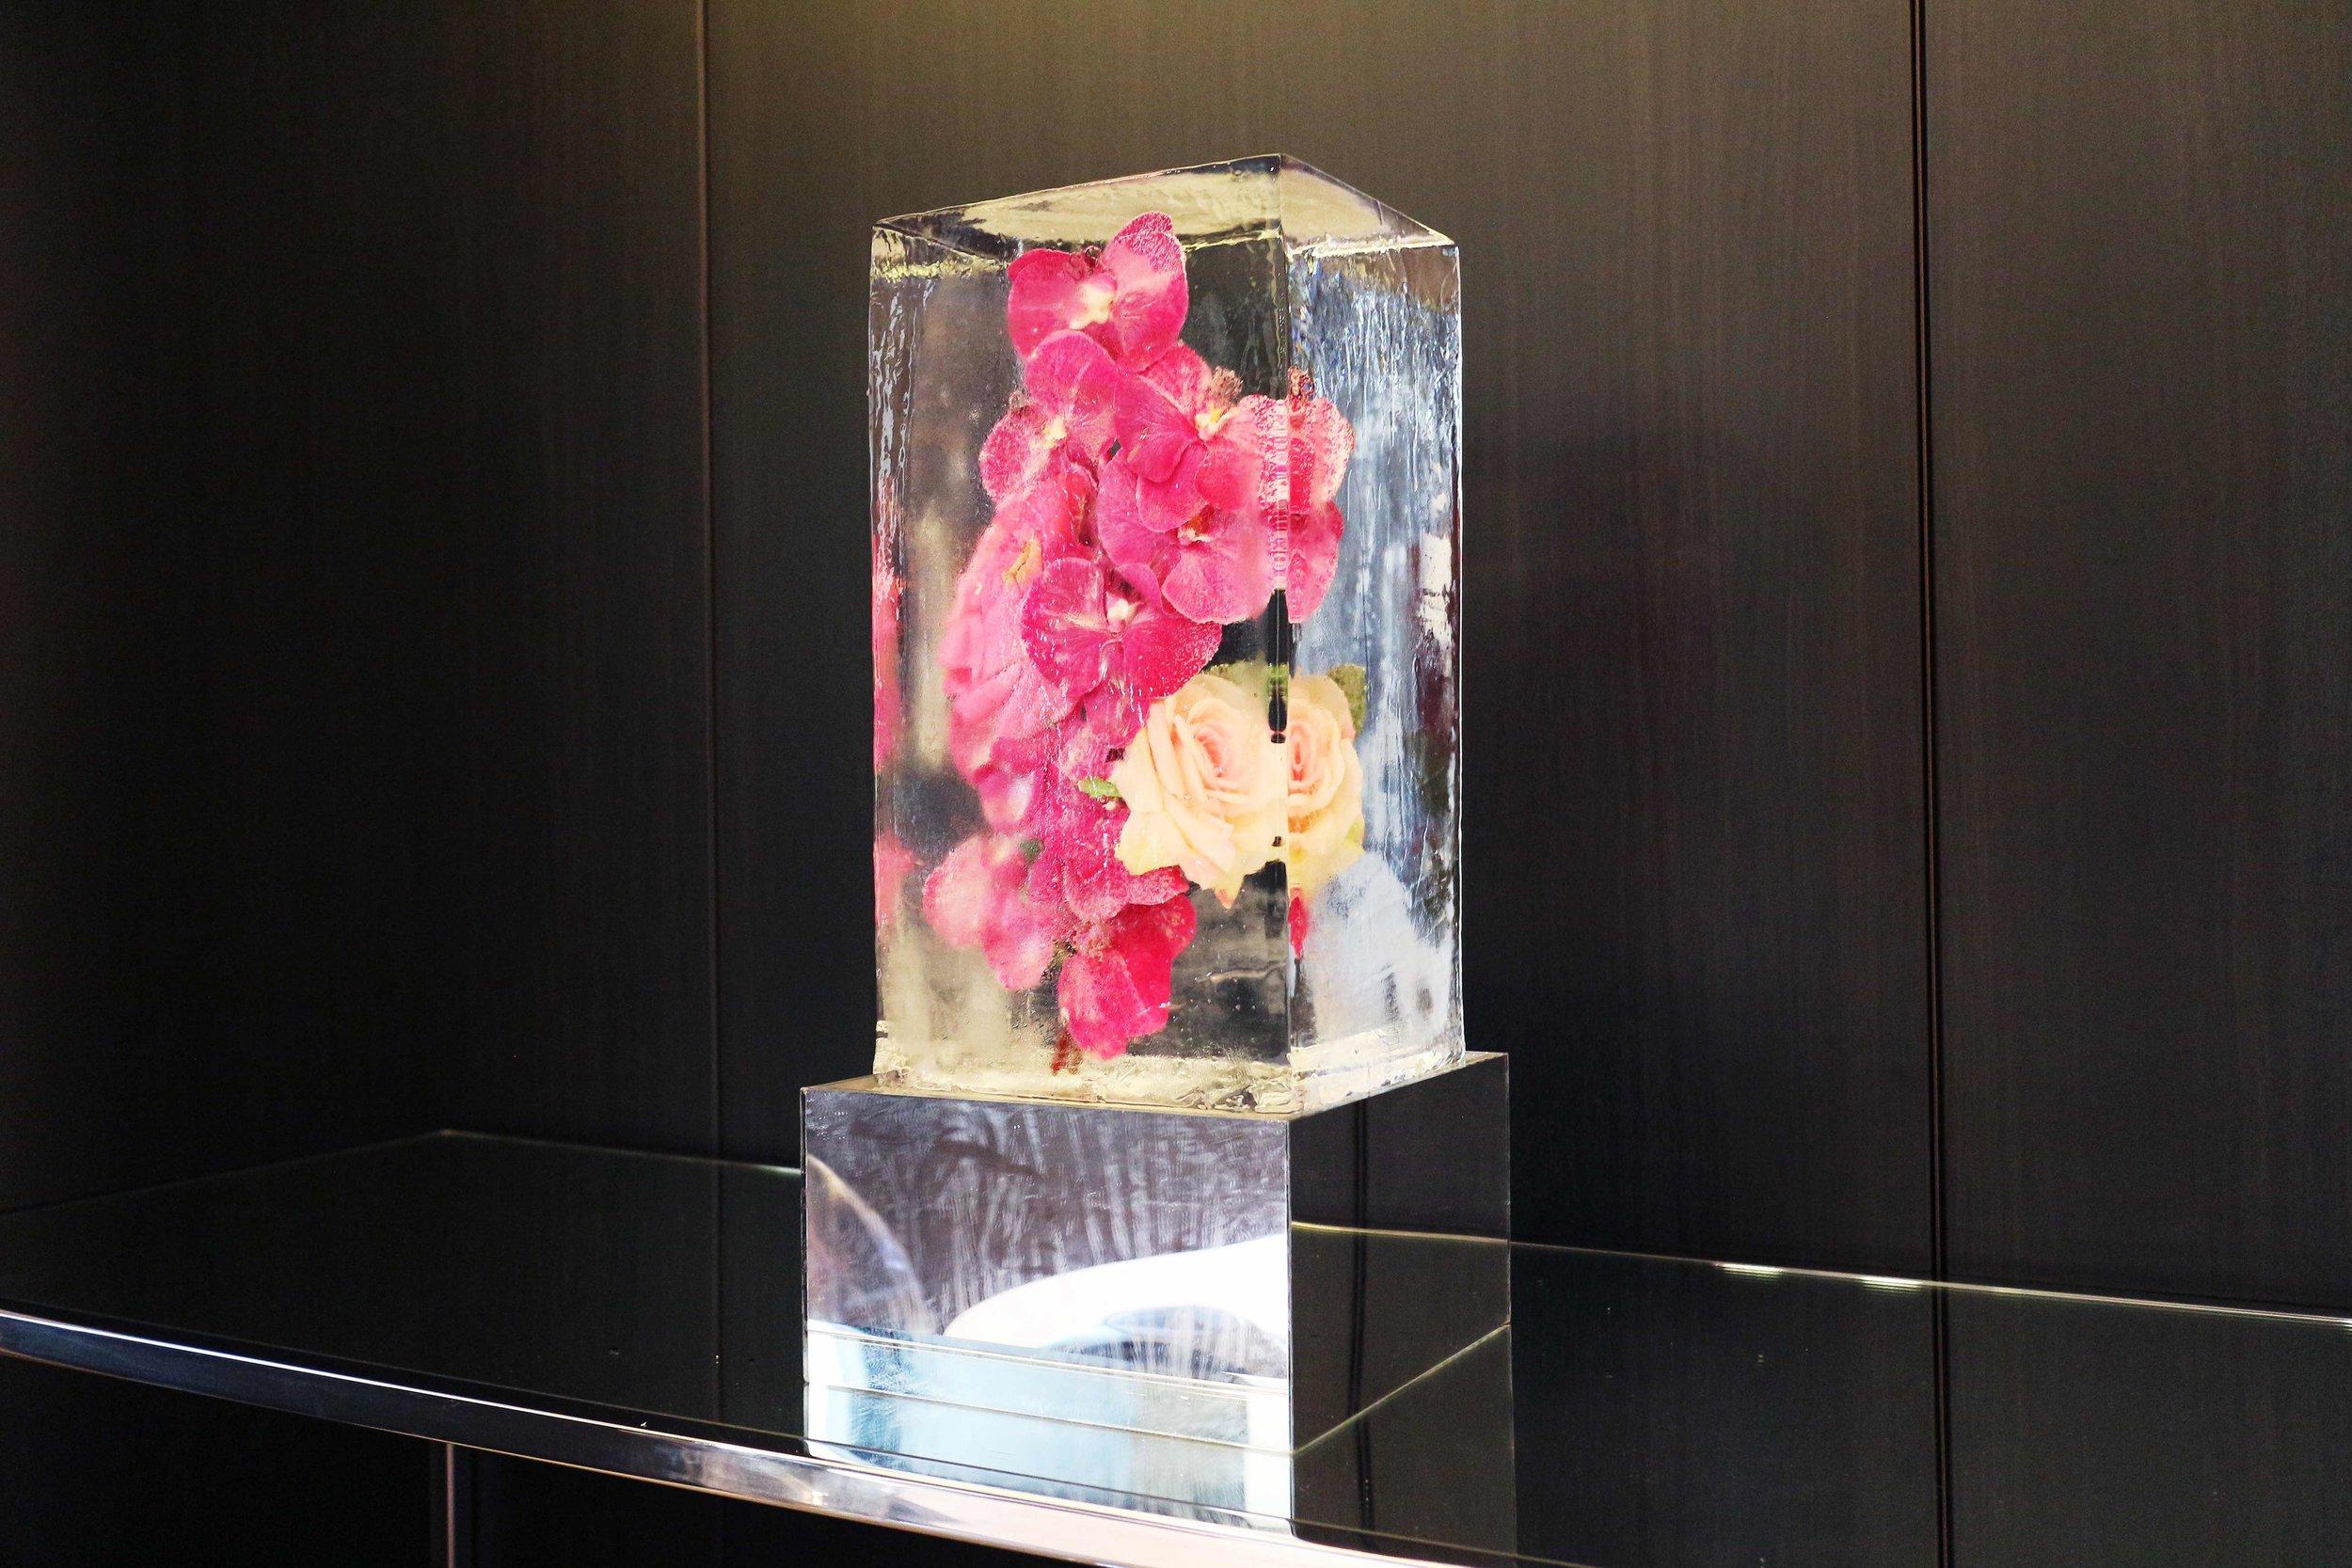 small_Original-20170719_Flowers_Frozen_Tabletop_Pedestal_Corporate_Event_Elizabeth_Arden 2.jpg